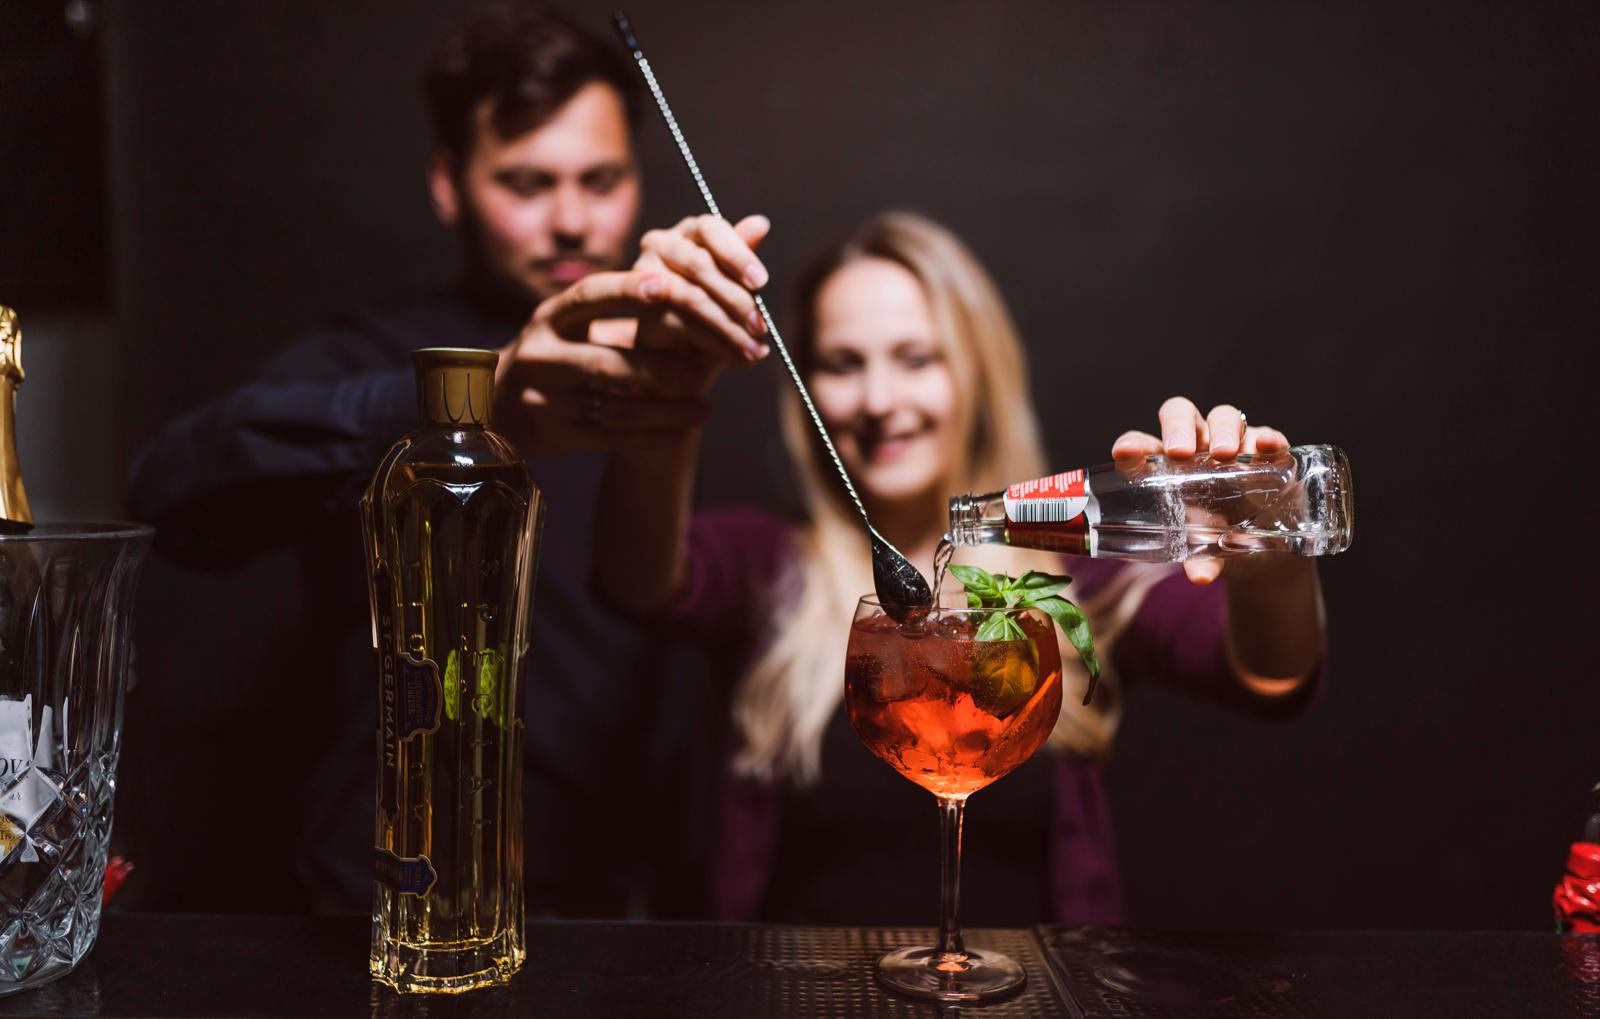 rum-tasting-freiburg-im-breisgau-bg3